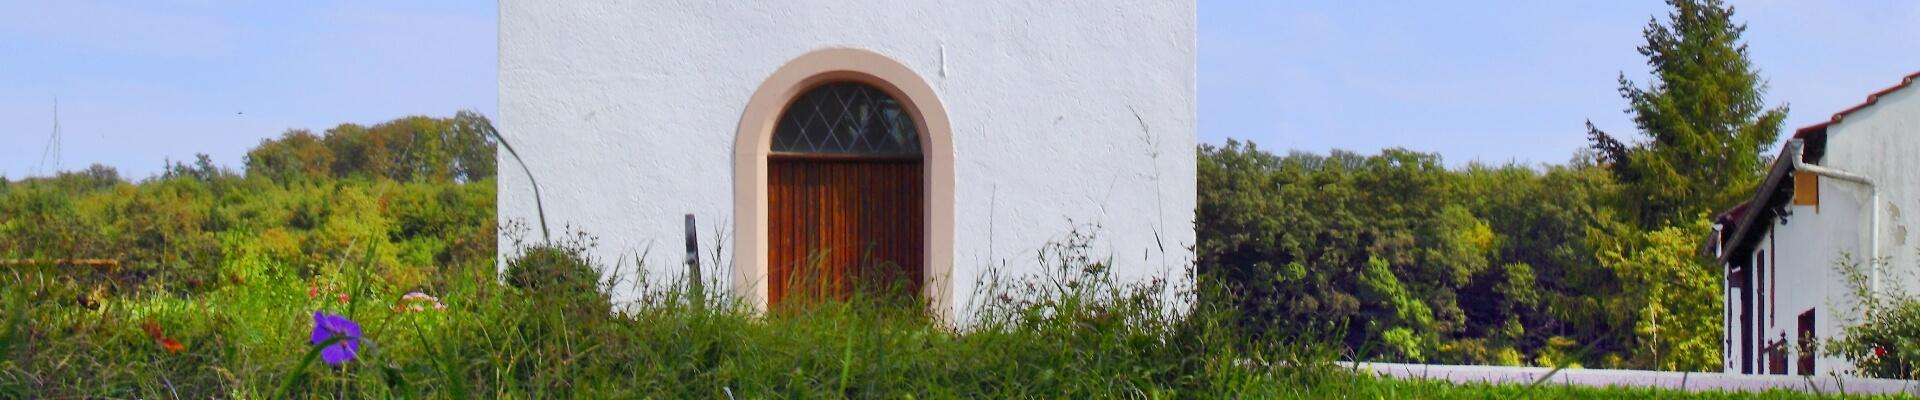 Kleinrinderfeld: Kirche Hero